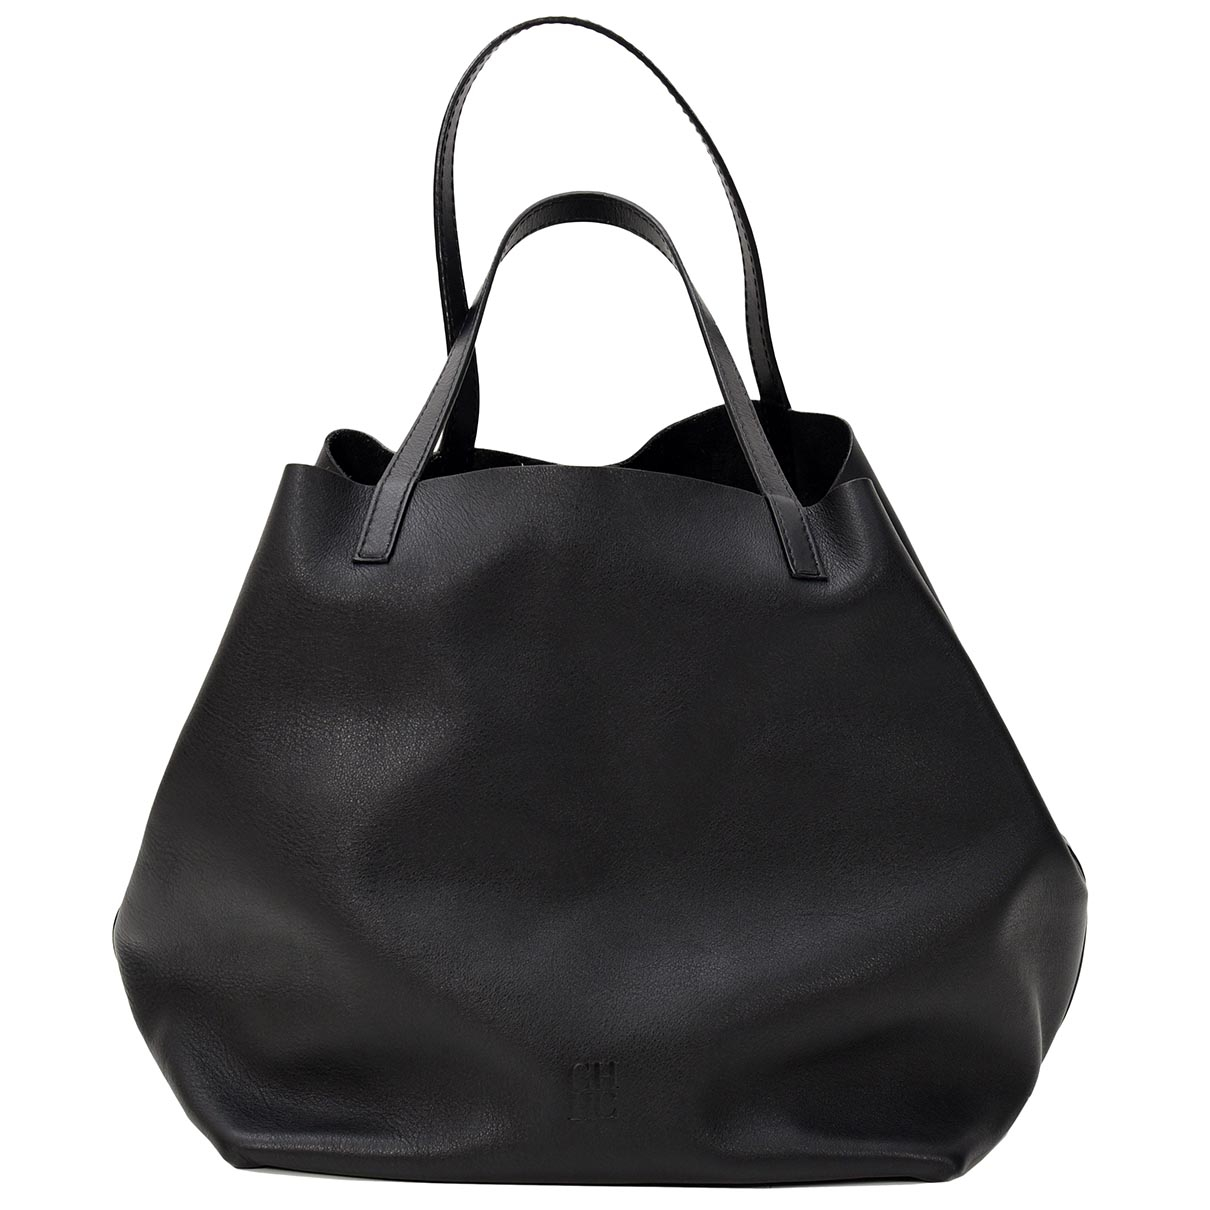 Carolina Herrera \N Black Fur handbag for Women \N